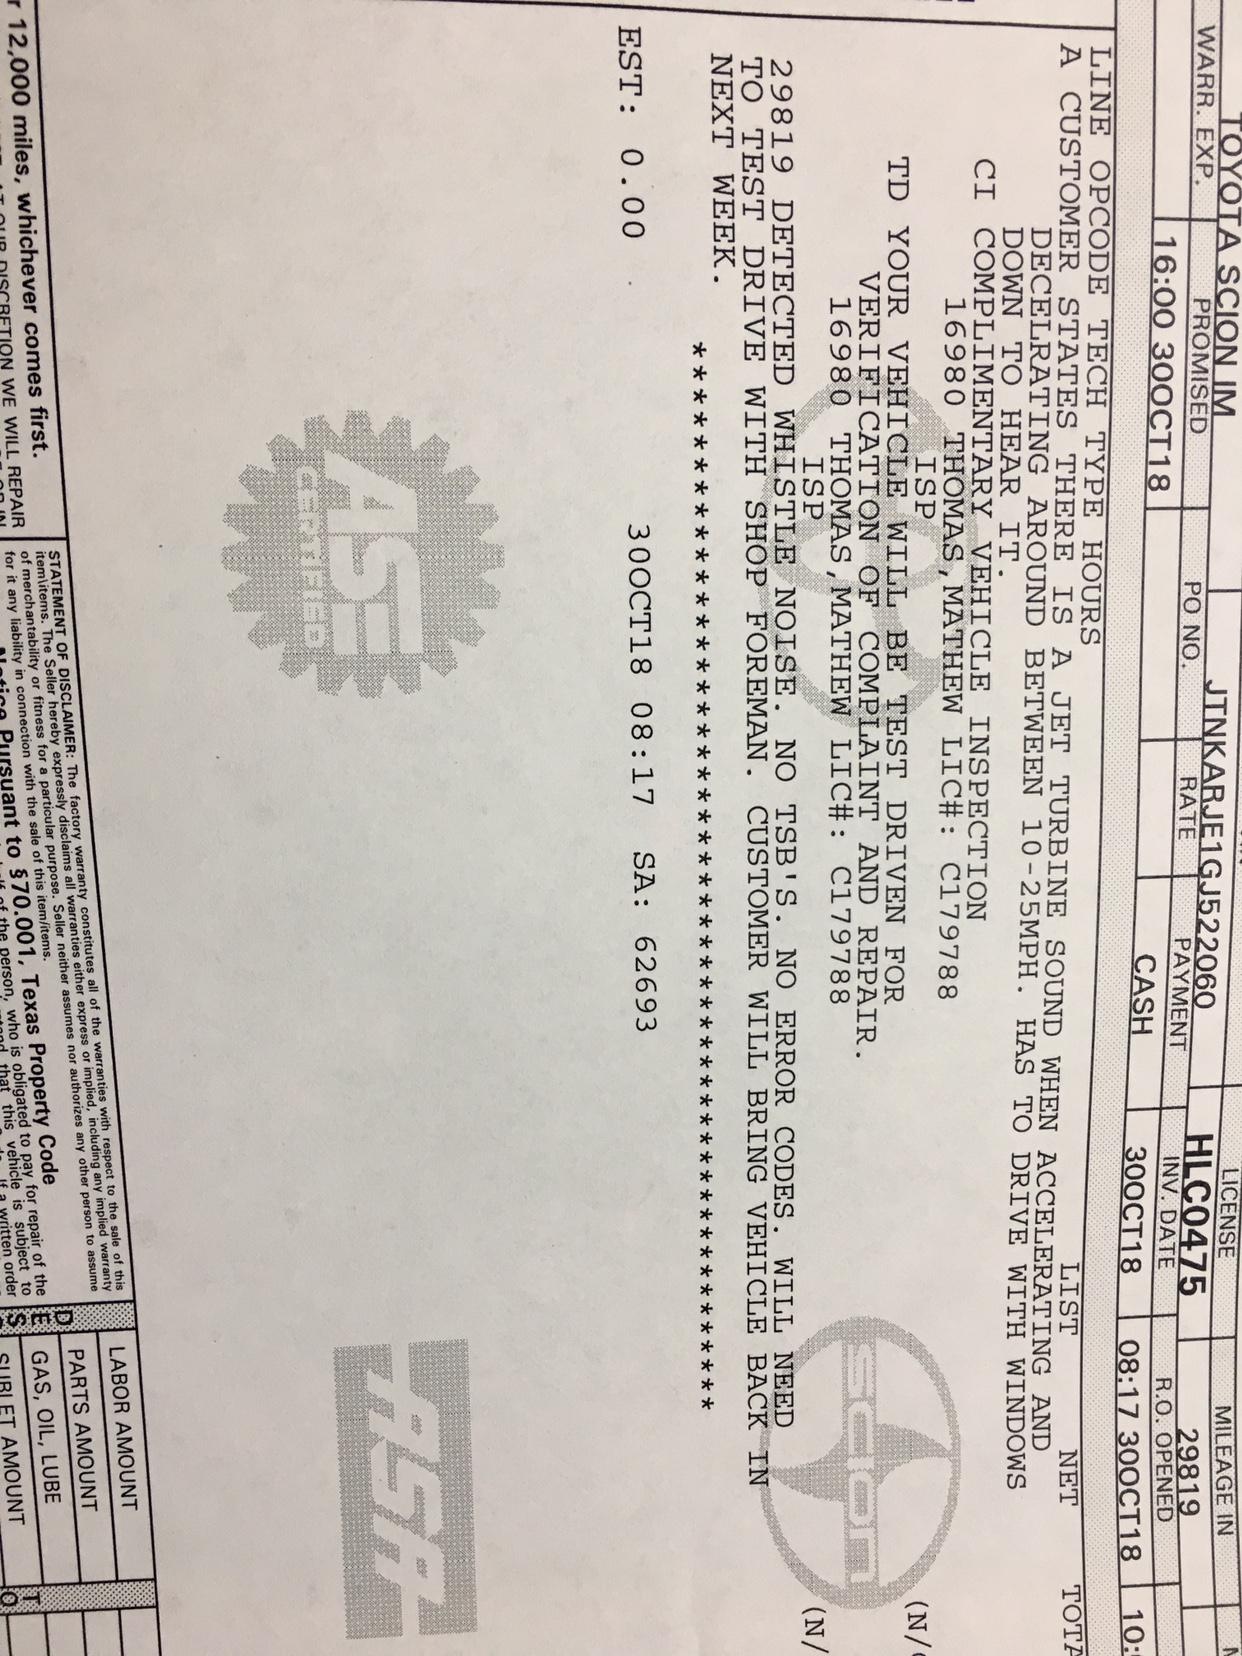 CVT Whistle while Accelerating/Decelerating 2016 Scion iM - Toyota